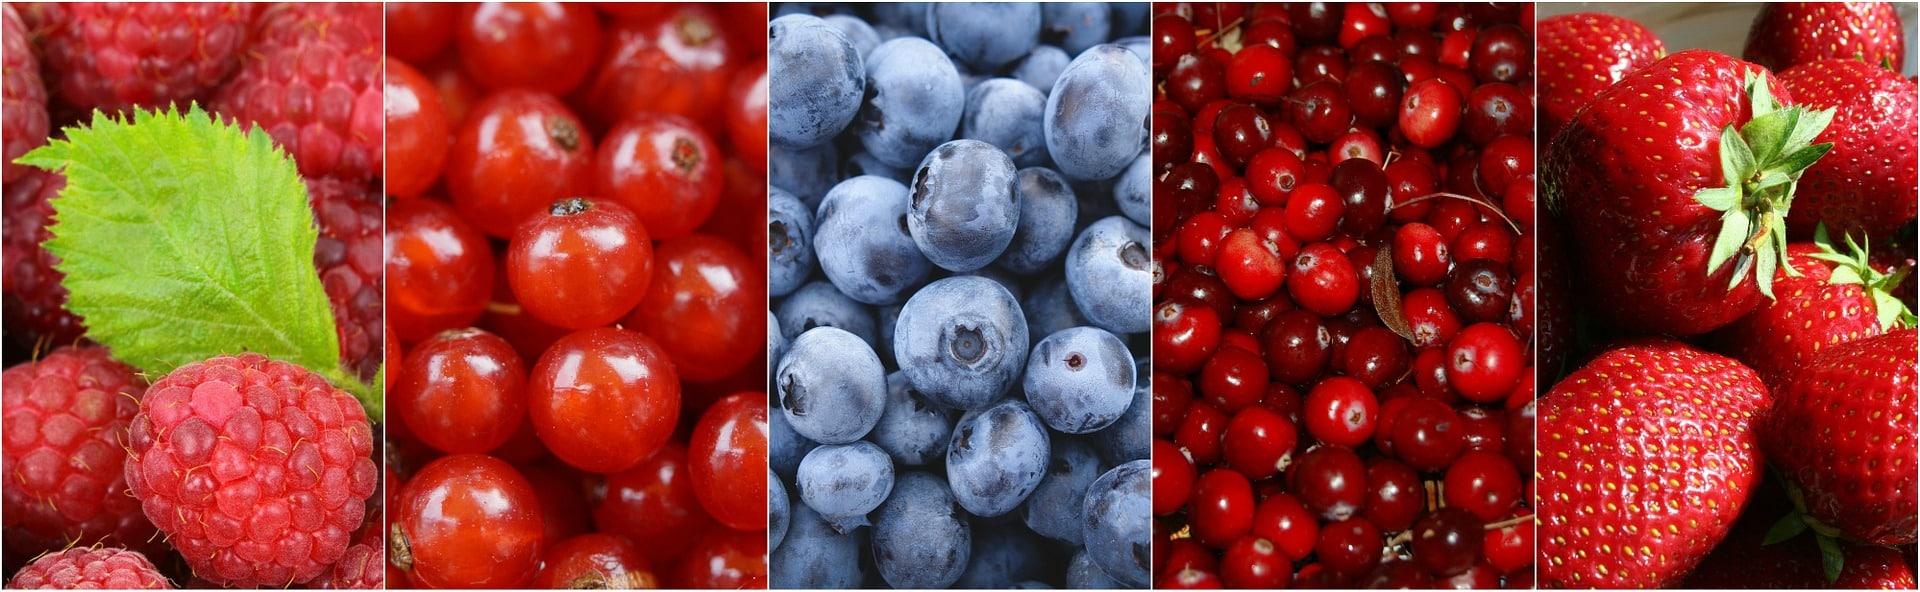 antioxydant naturel fruit baies antioxydantes